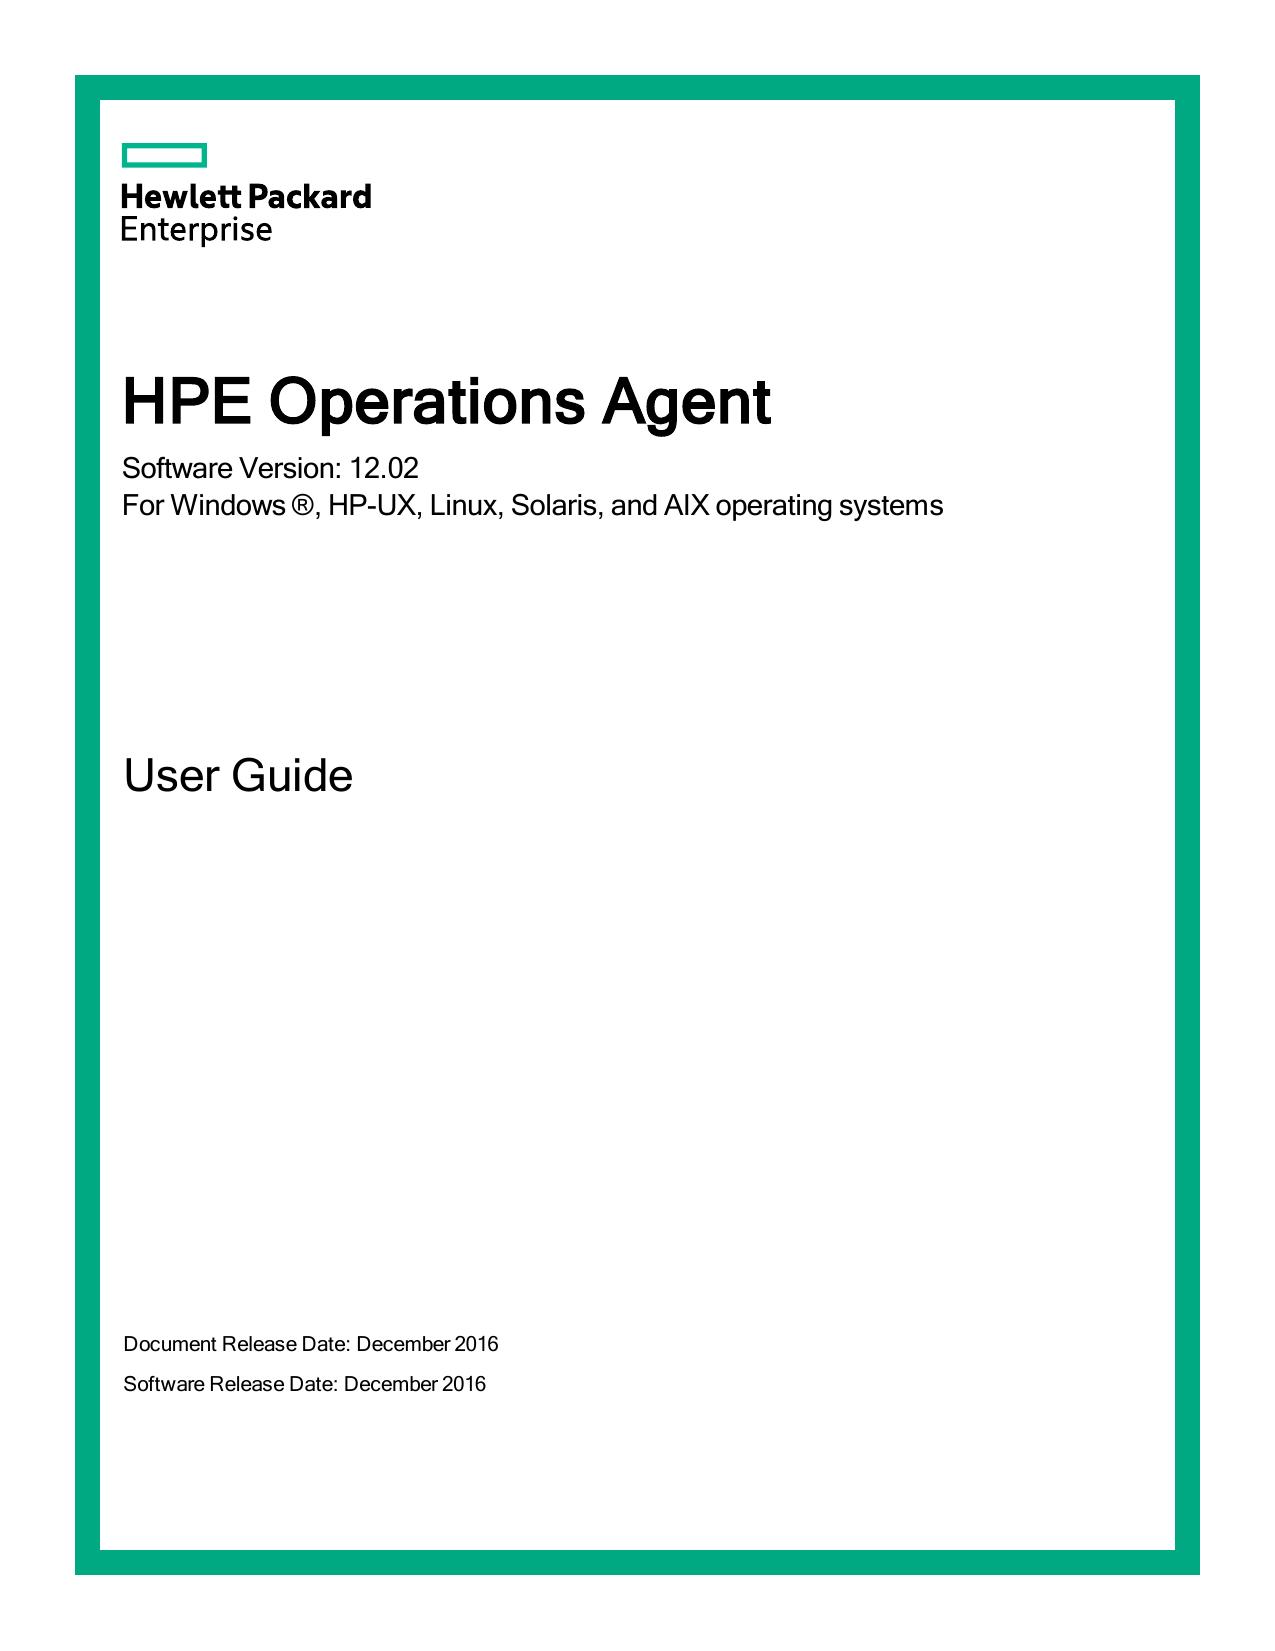 HPE Operations Agent - User Guide | manualzz com